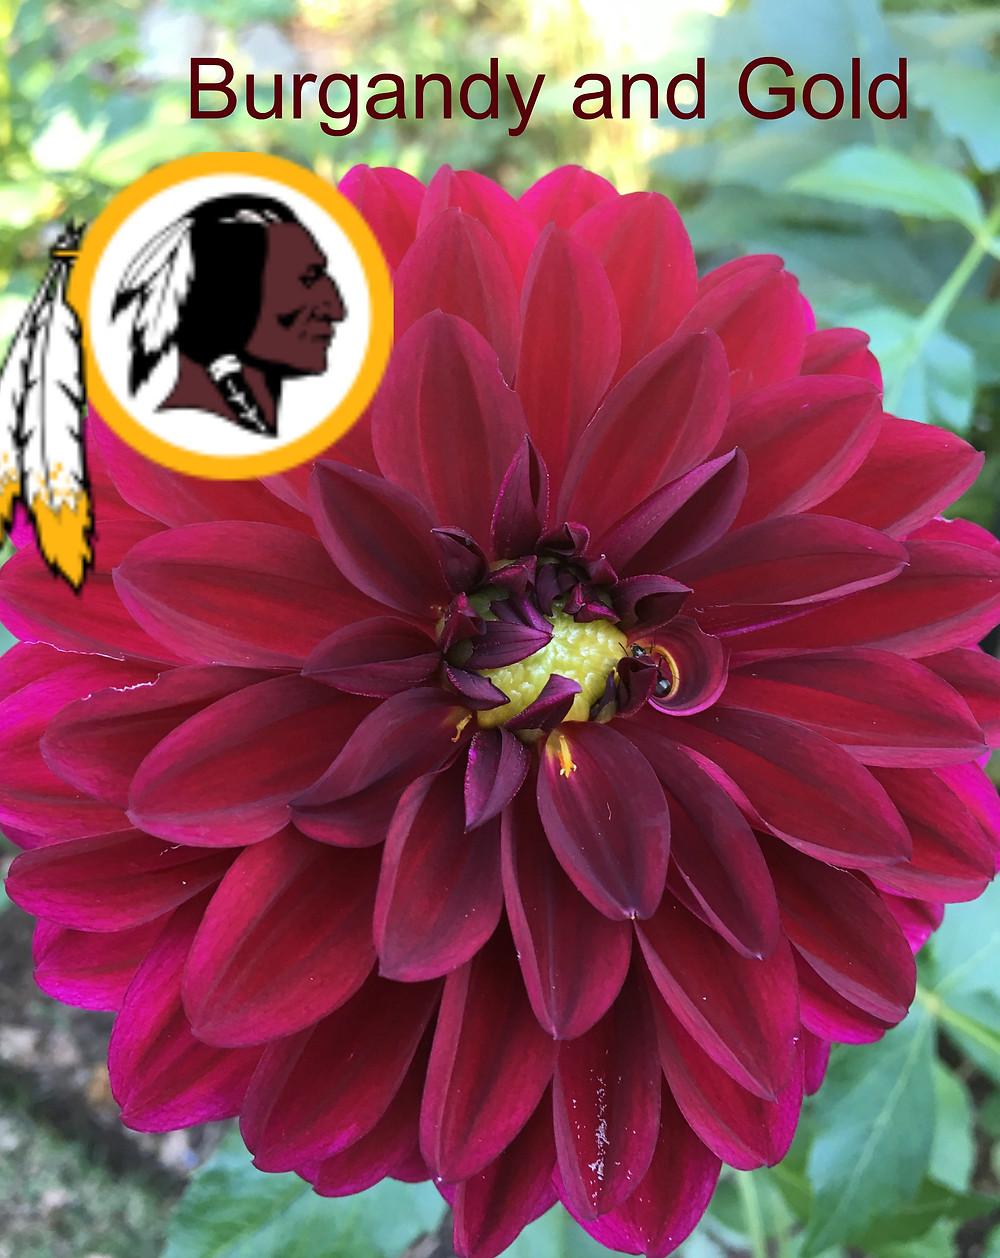 A beautiful dahlia specimen shares colors with the Washington Redskin football team